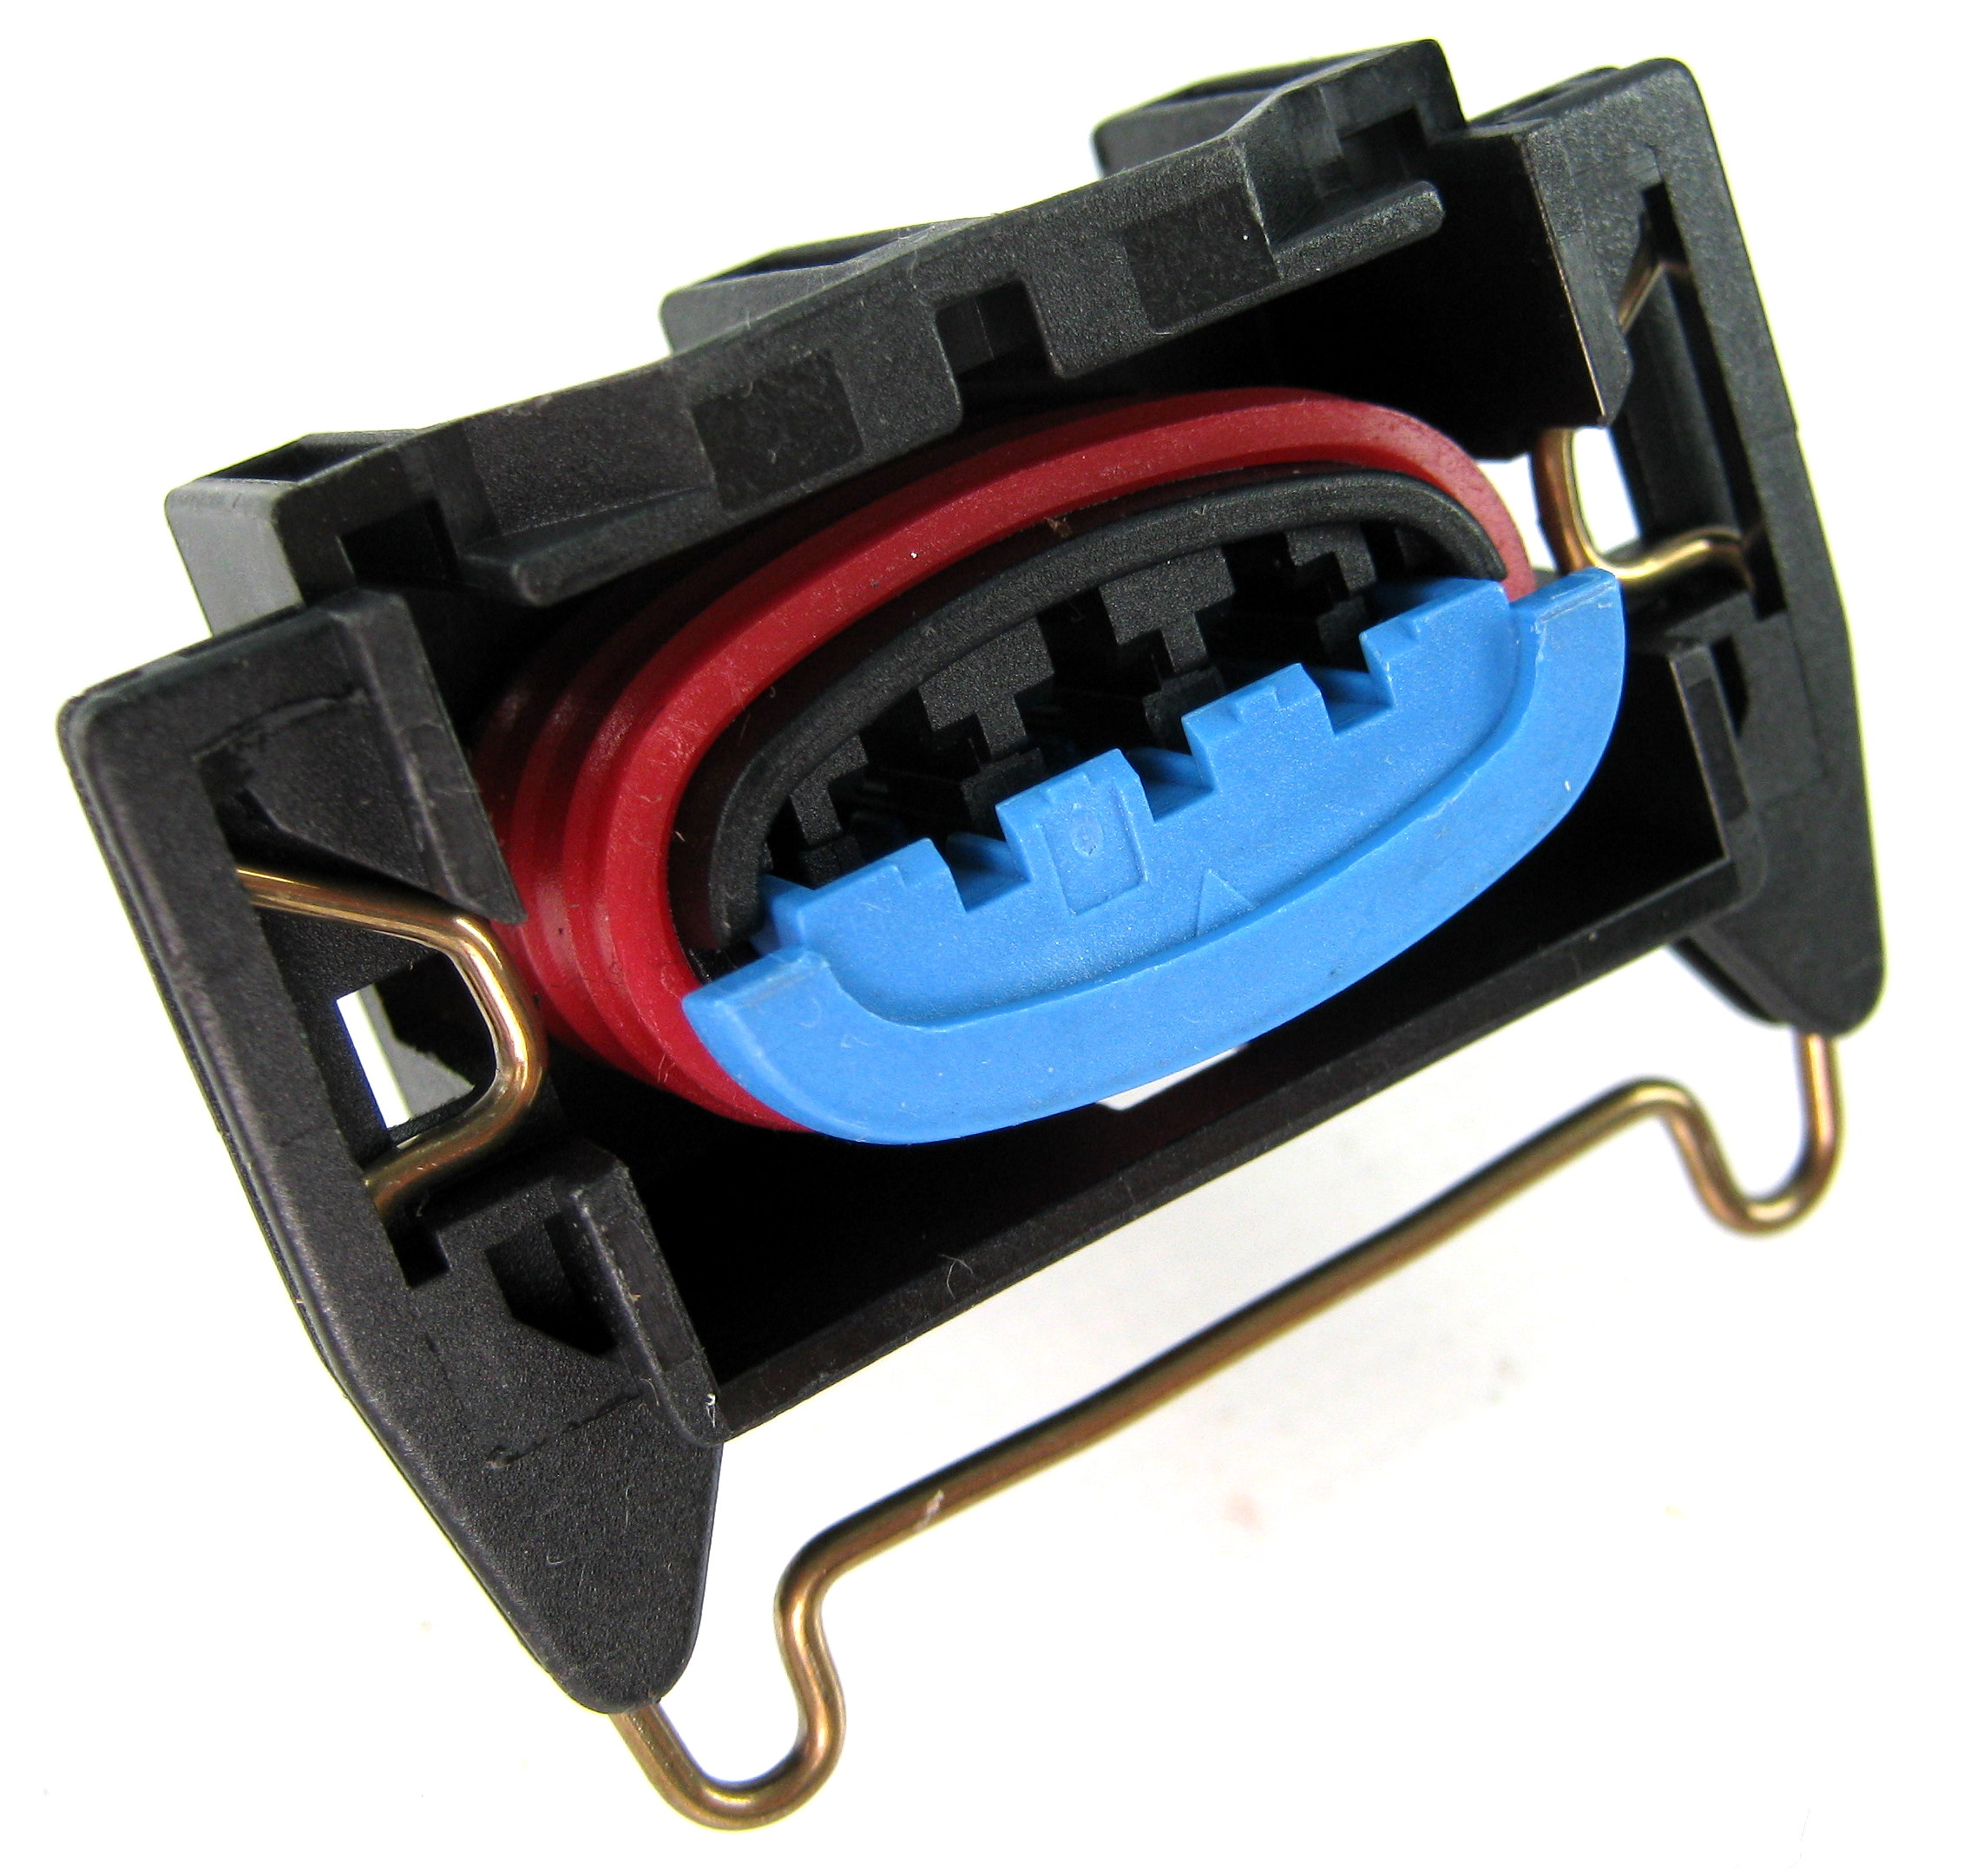 ford edis 4 wiring diagram 97 subaru impreza stereo coil pack connector plug kit megasquirt new